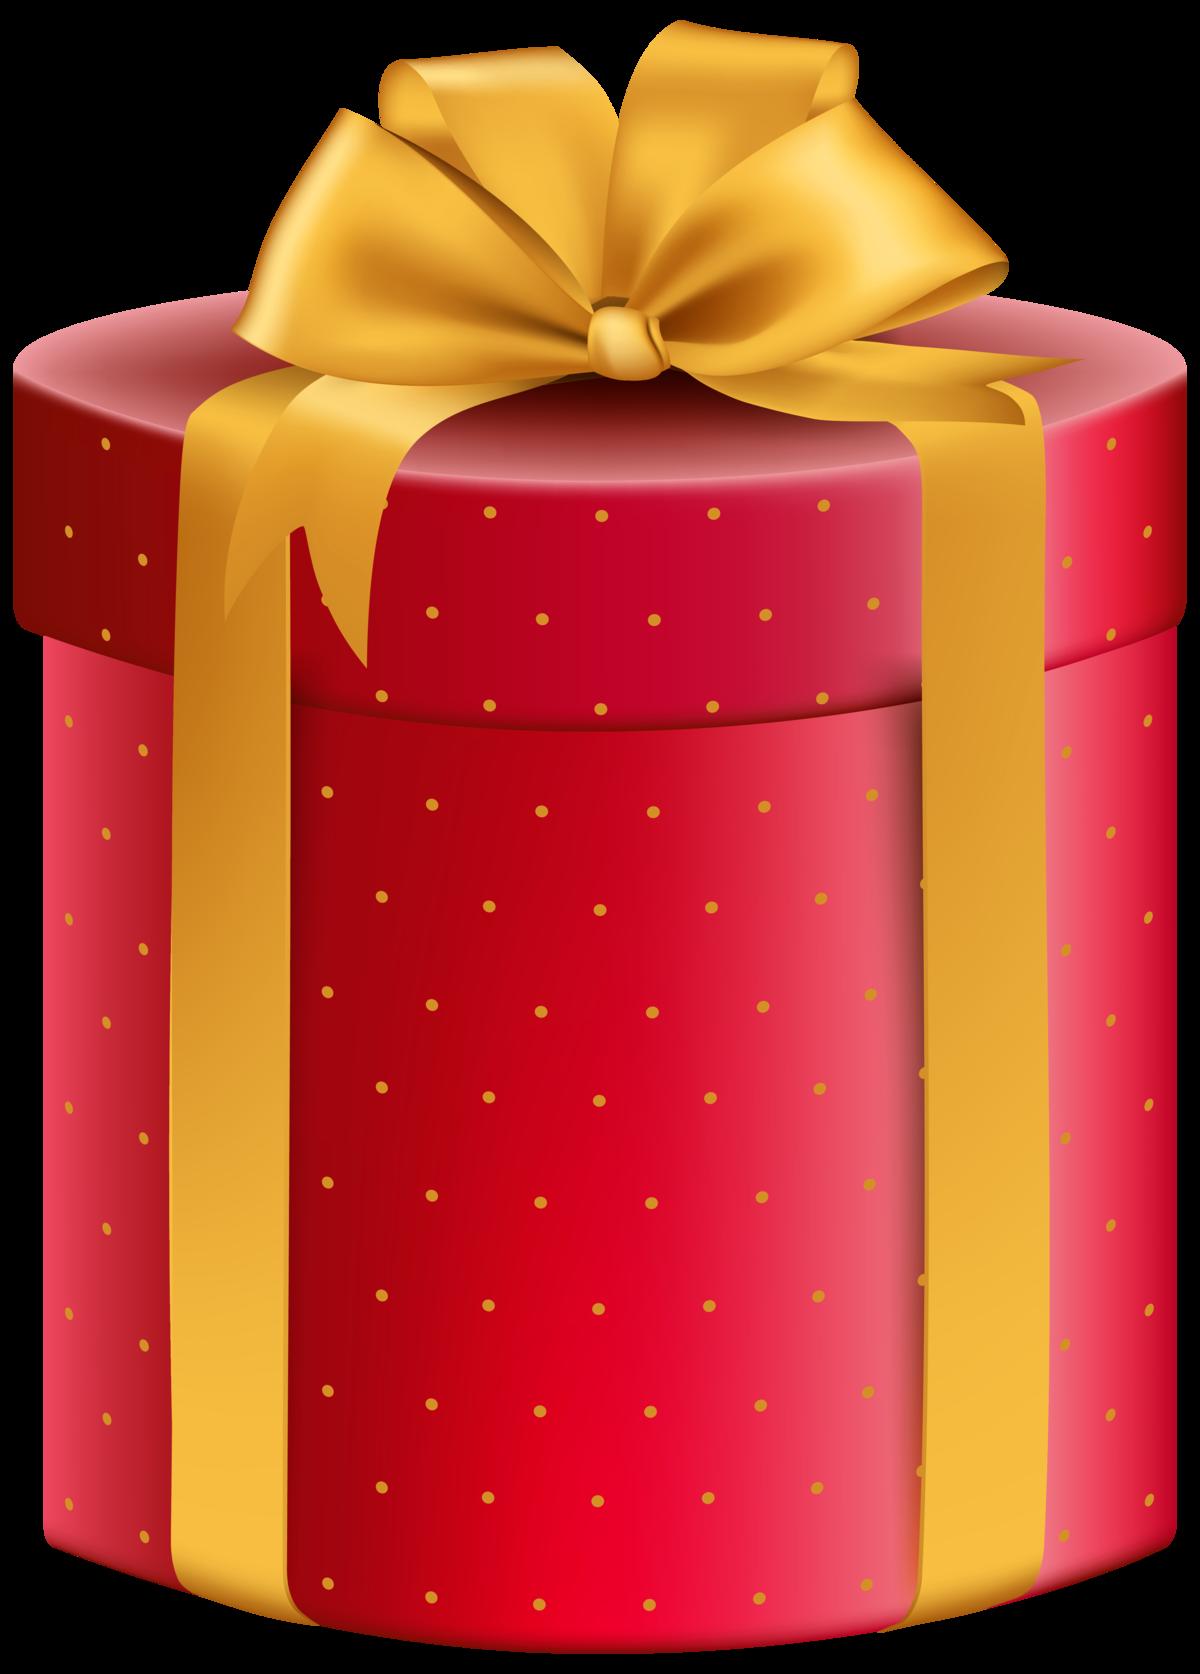 картинка маленького подарка прибор